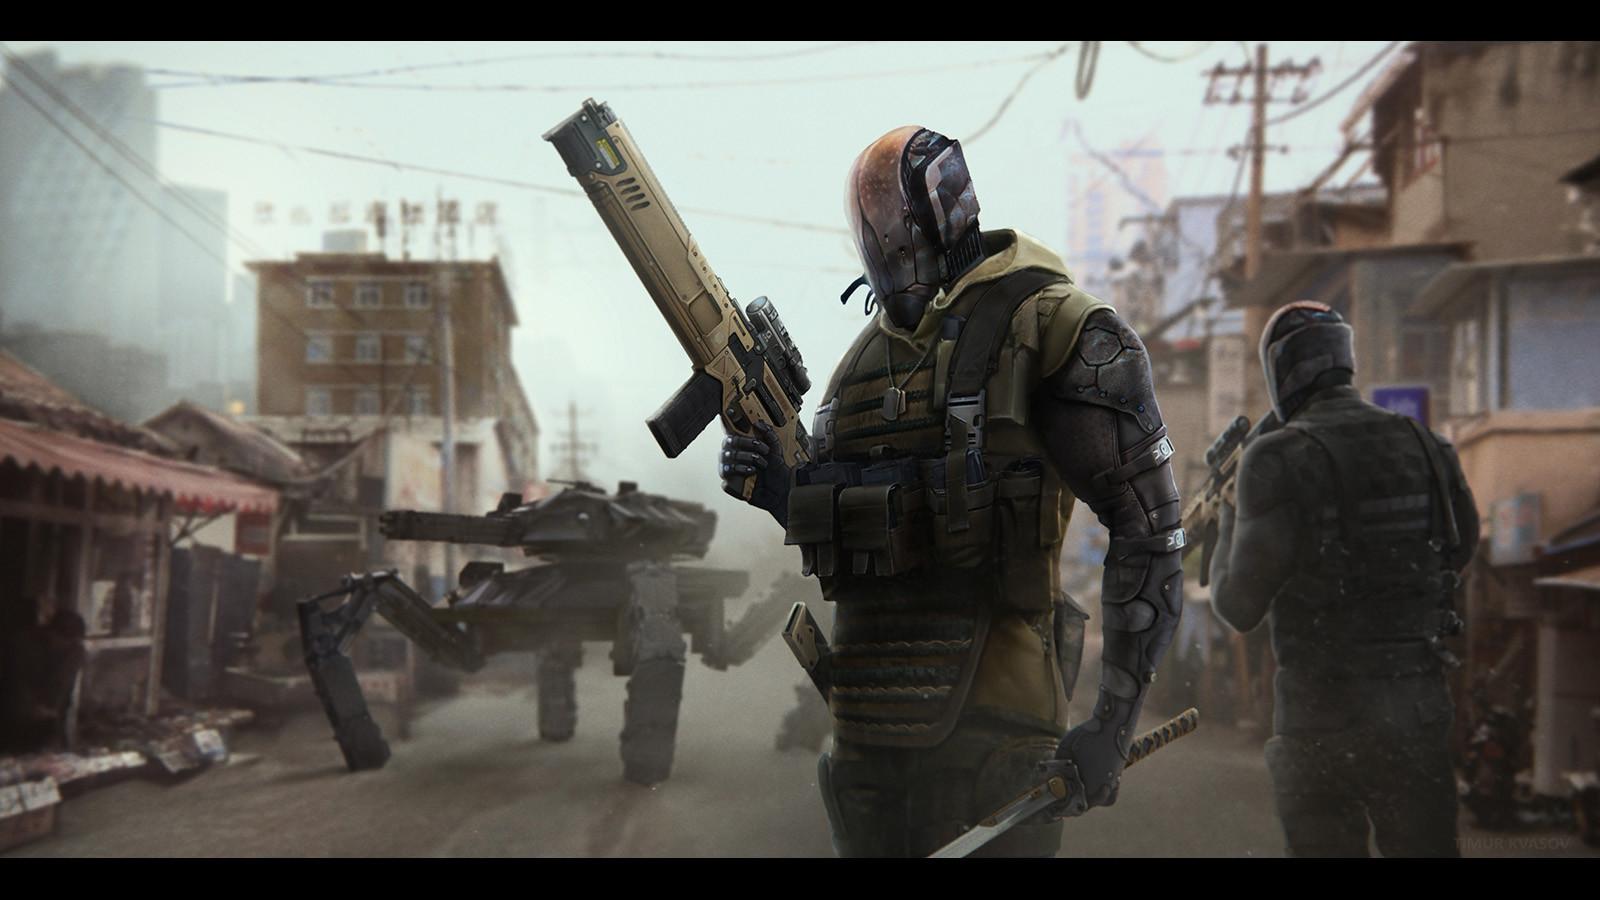 Timur kvasov slum patrol